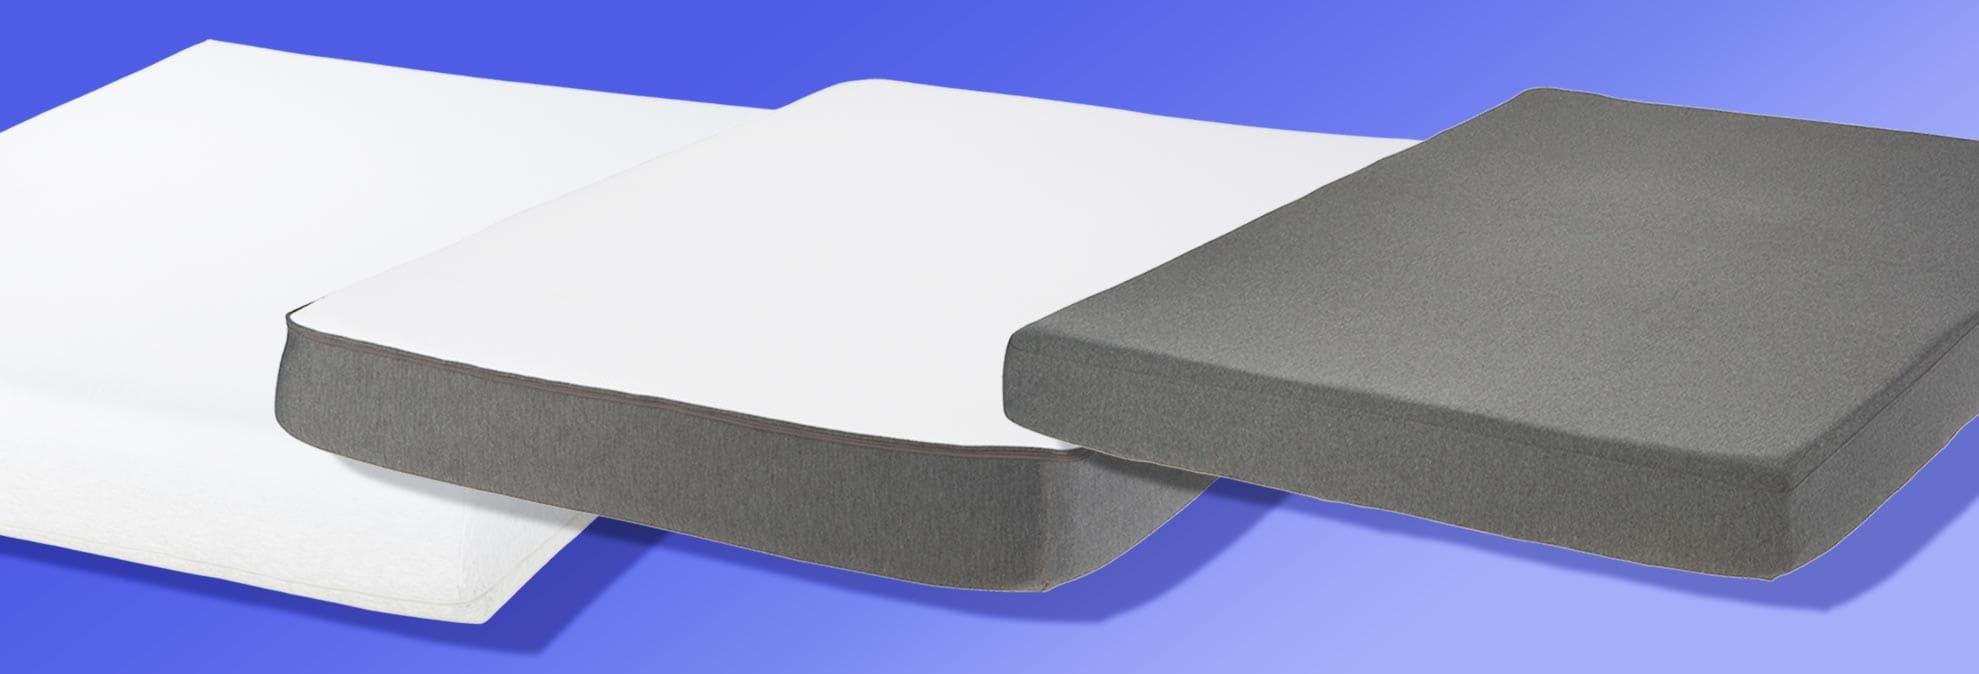 how casper s 2 new mattresses stack up consumer reports